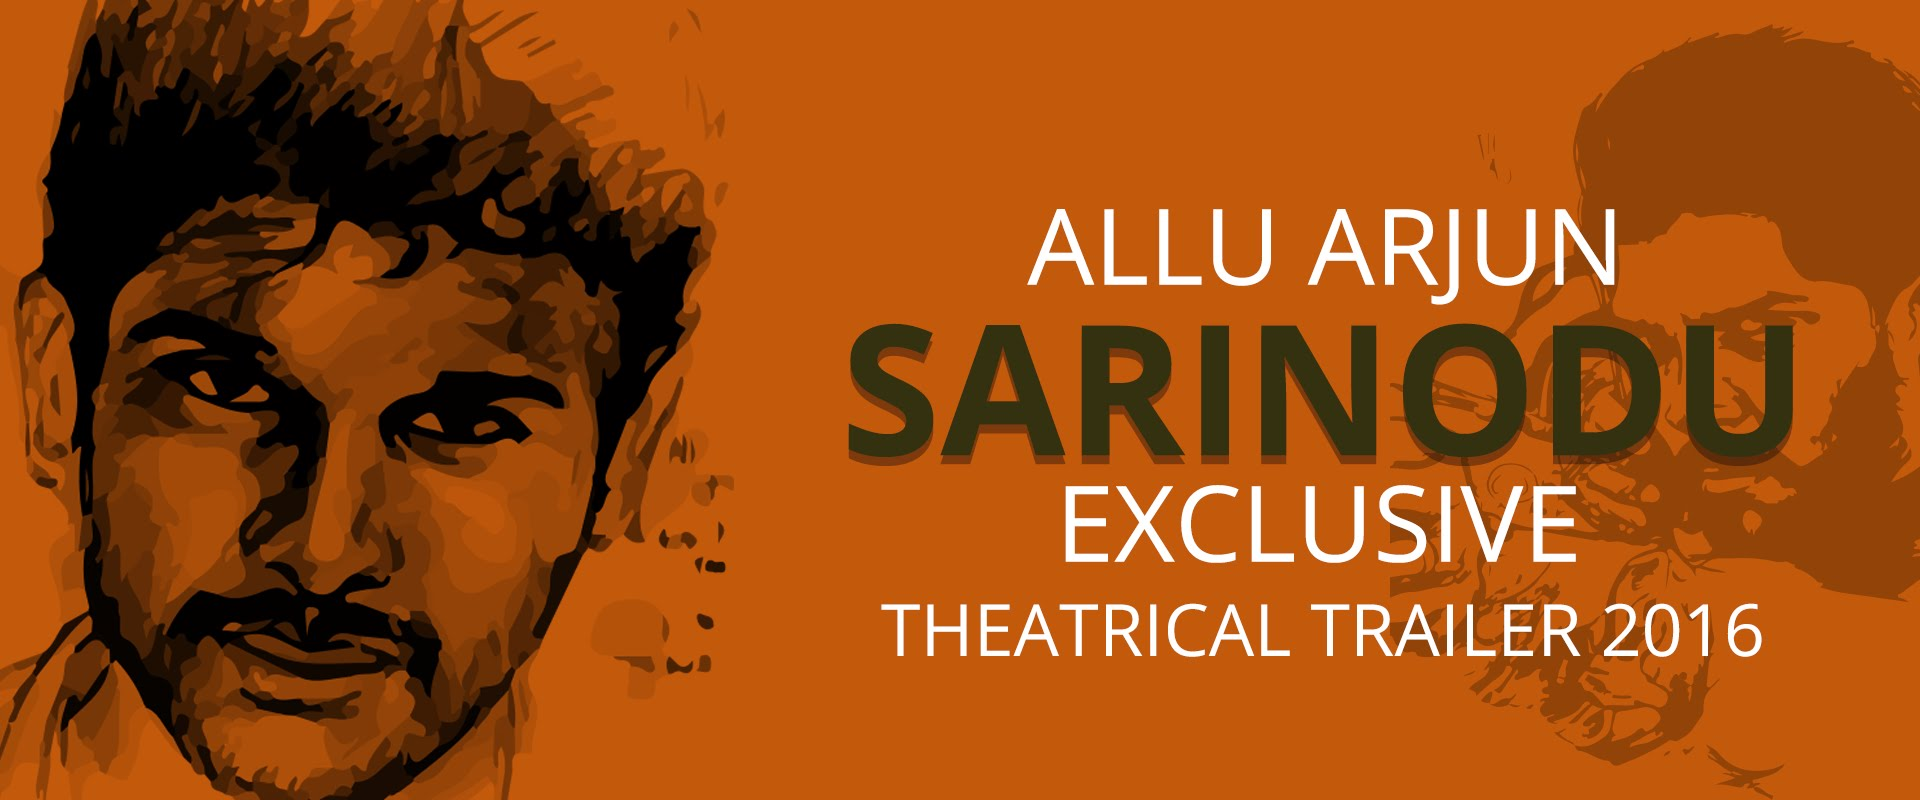 Sarinodu Latest Trailer 2016 | Exclusive official theatrical trailer allu  arjun - YouTube